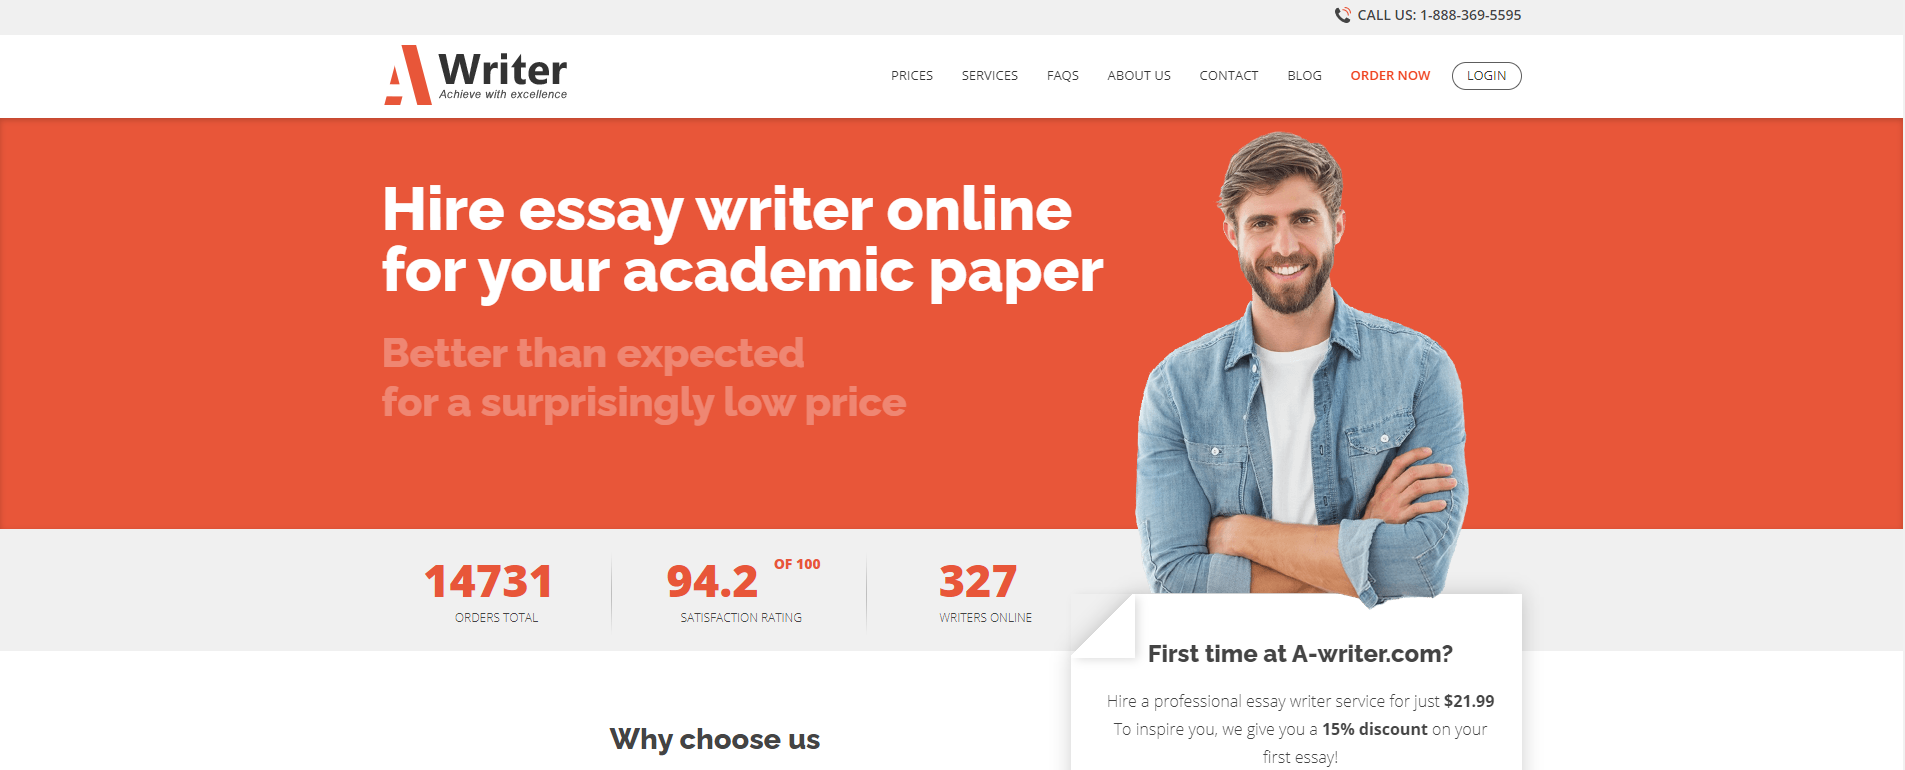 A writer - Best essay writing service